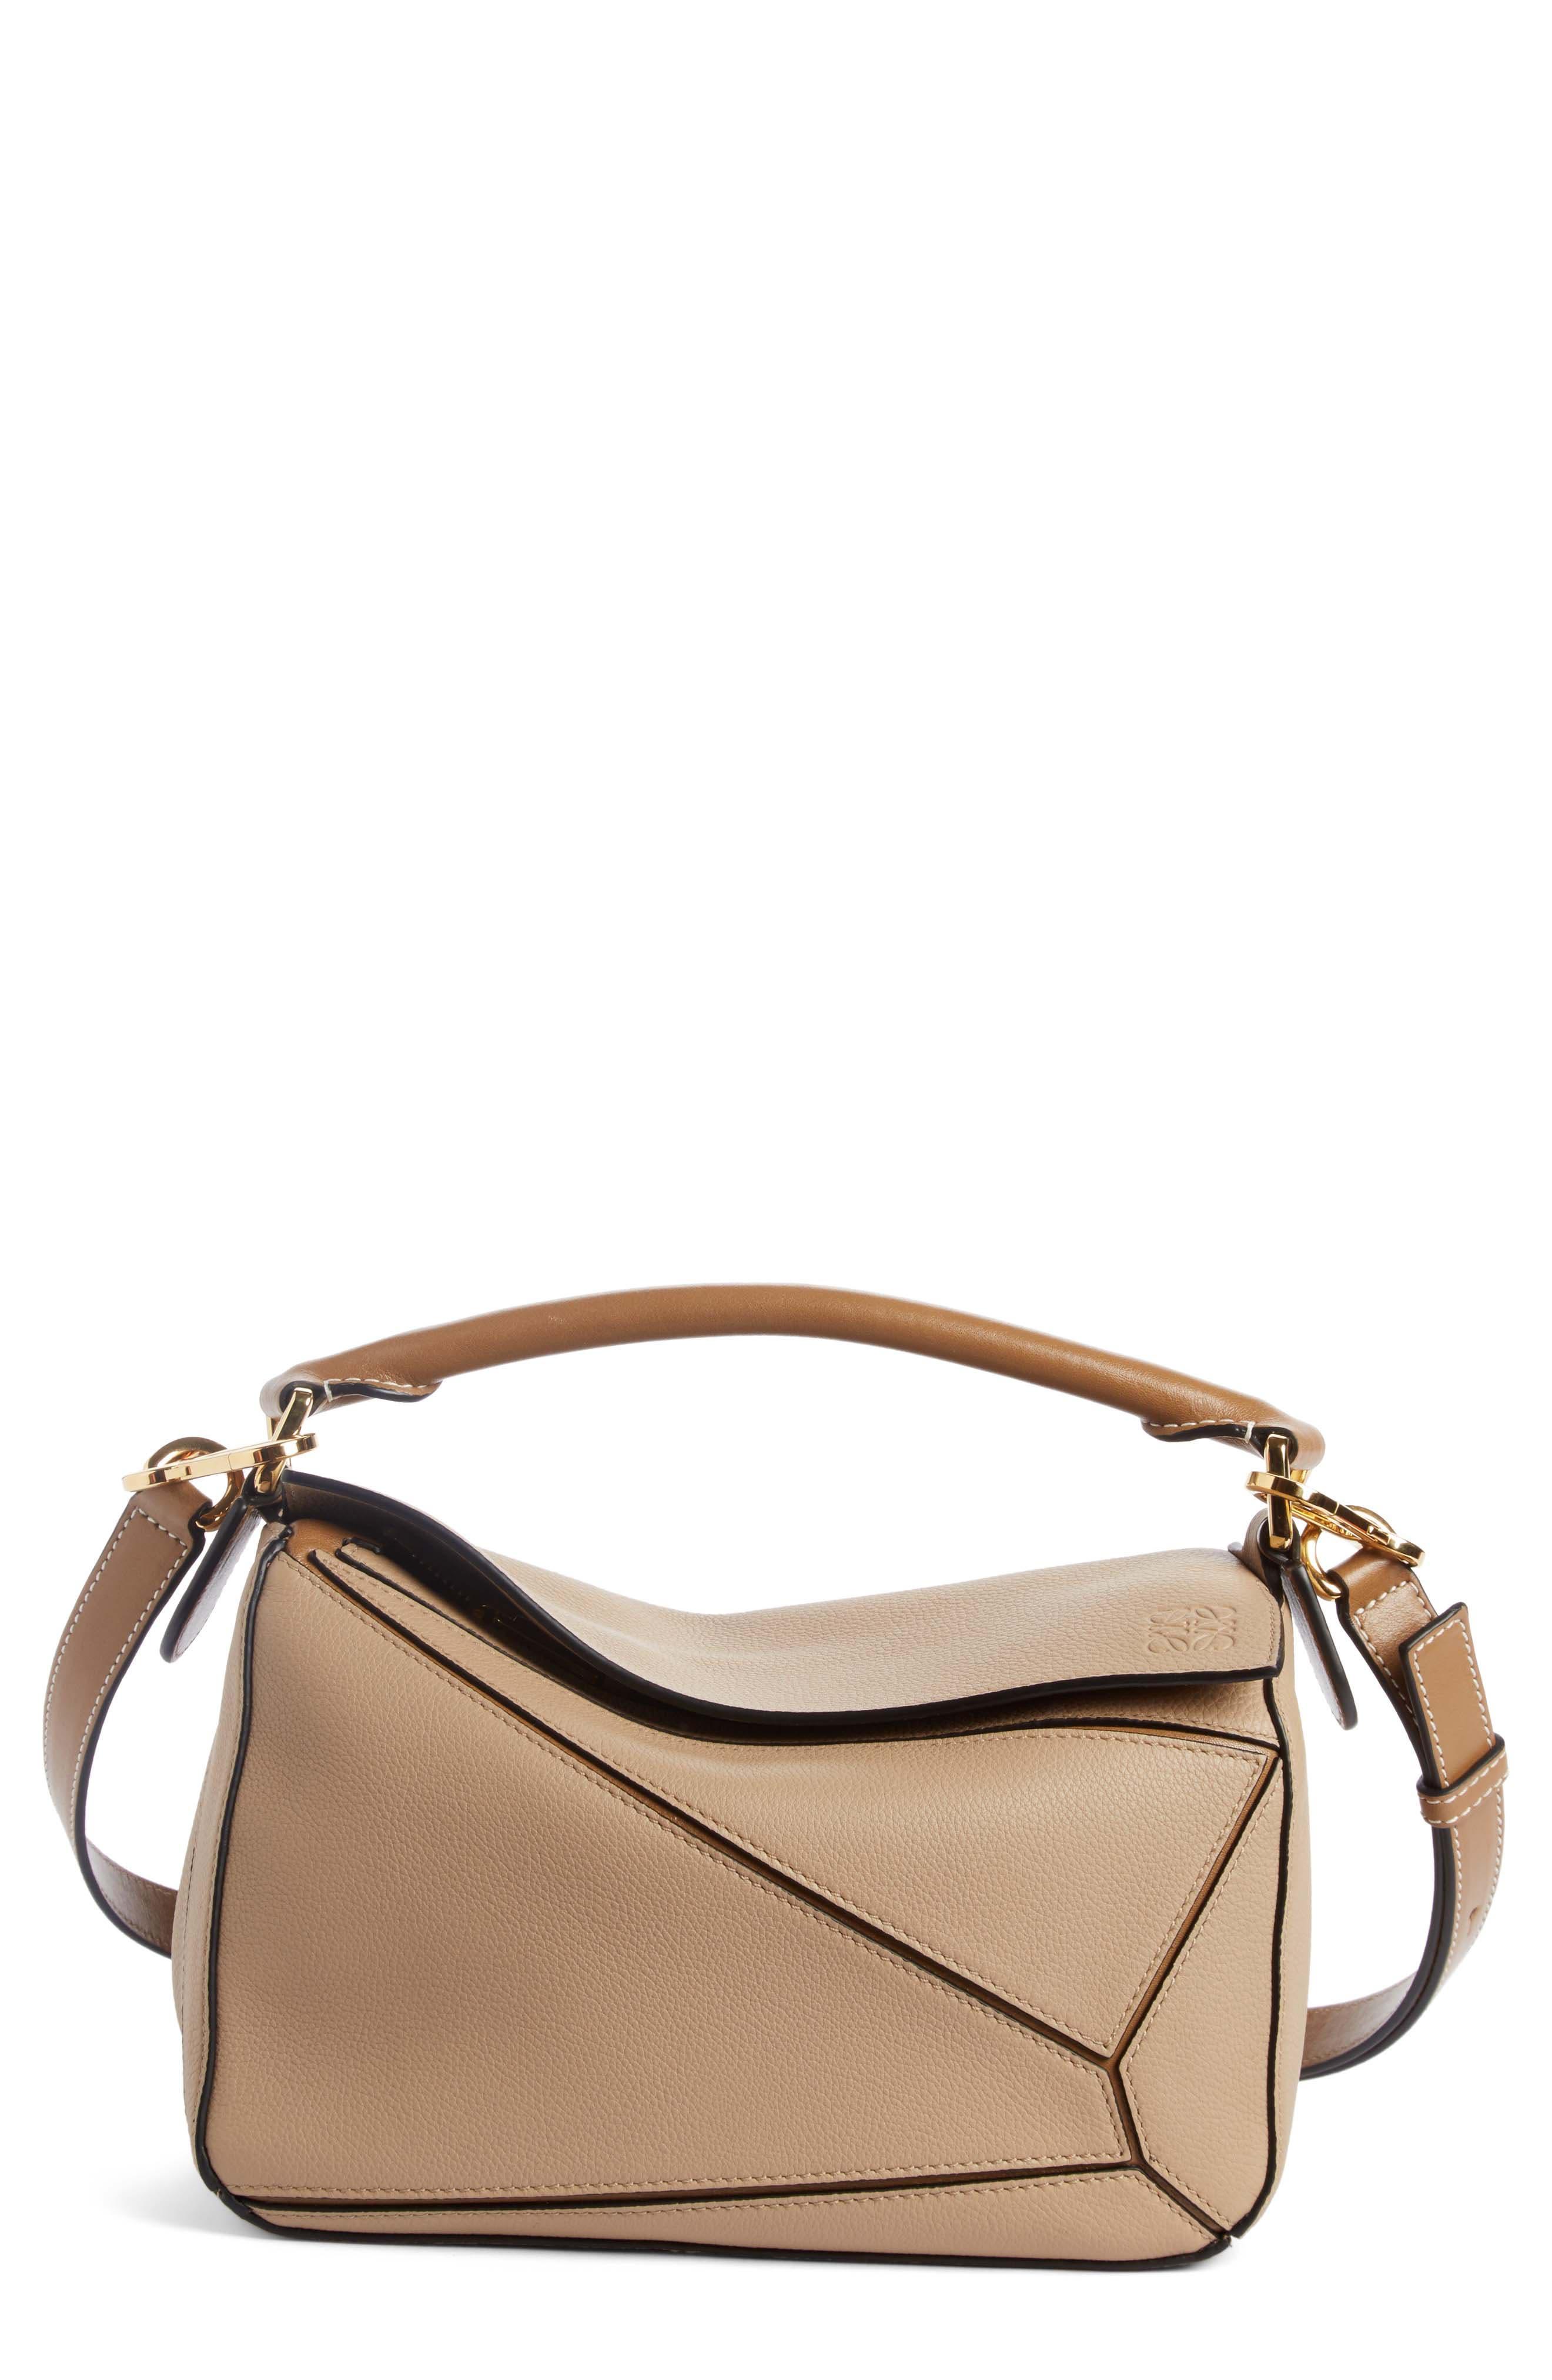 Medium Puzzle Calfskin Leather Shoulder Bag,                             Main thumbnail 1, color,                             200